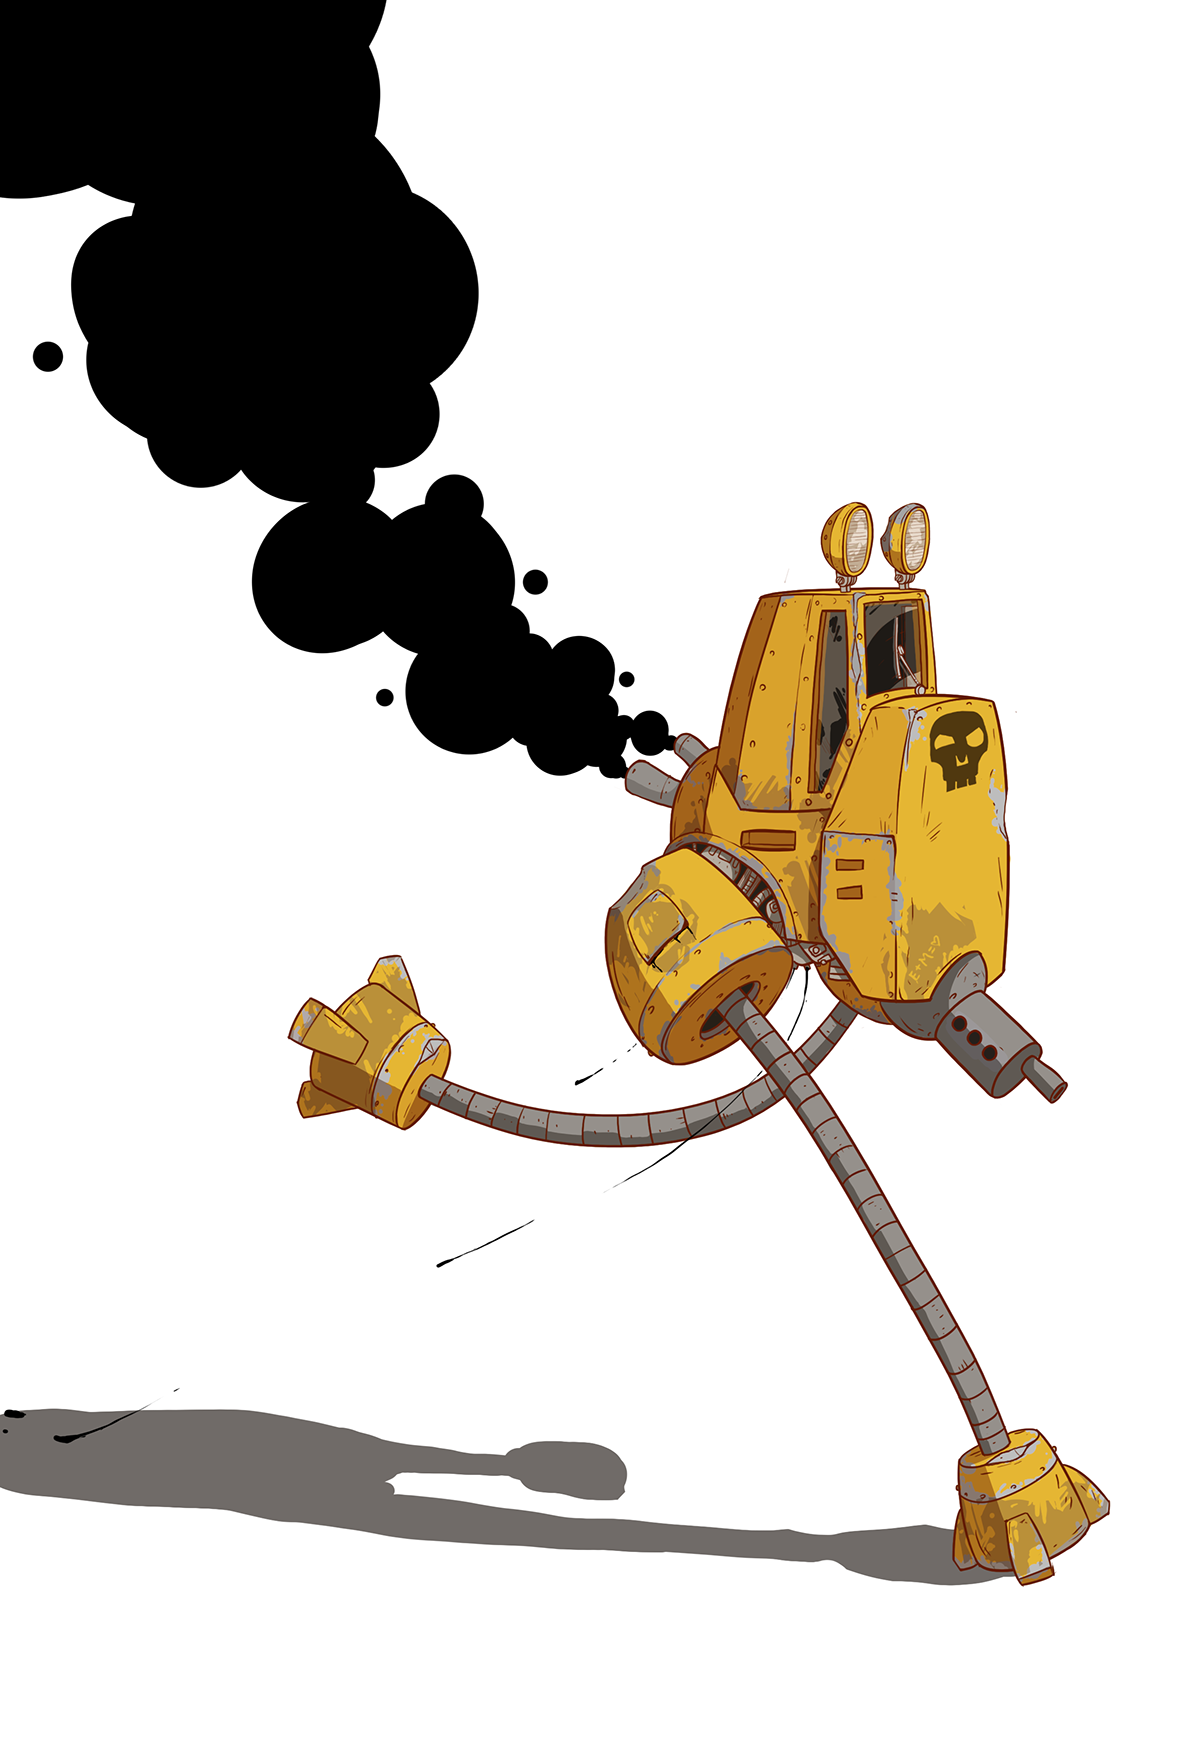 project Robot Szhmobot